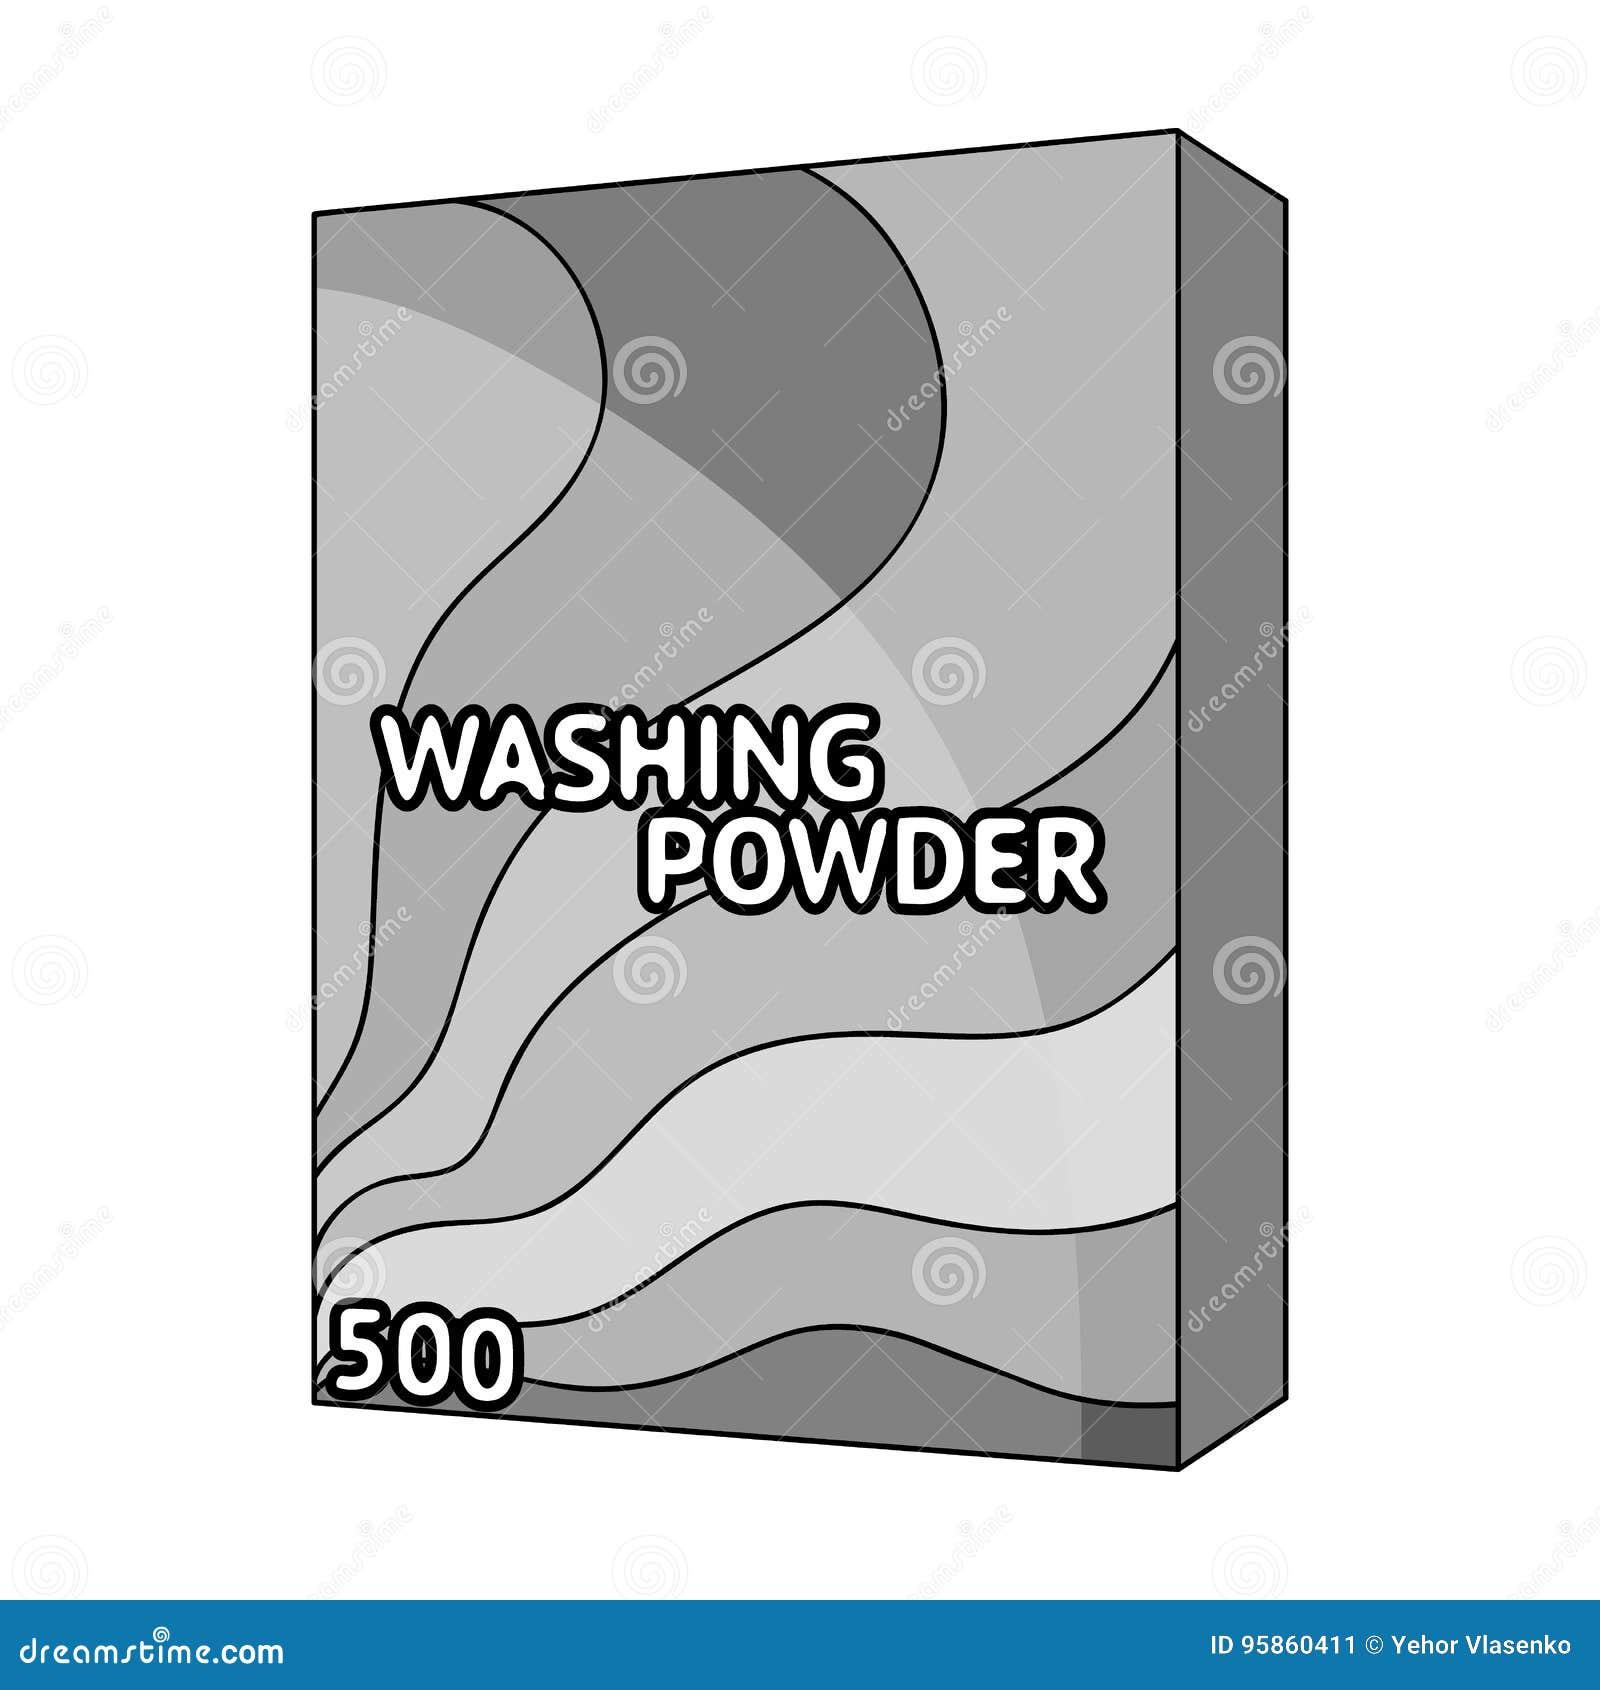 Washing powder dry cleaning single icon in outline style vector dry cleaning single icon in outline style vector buycottarizona Choice Image